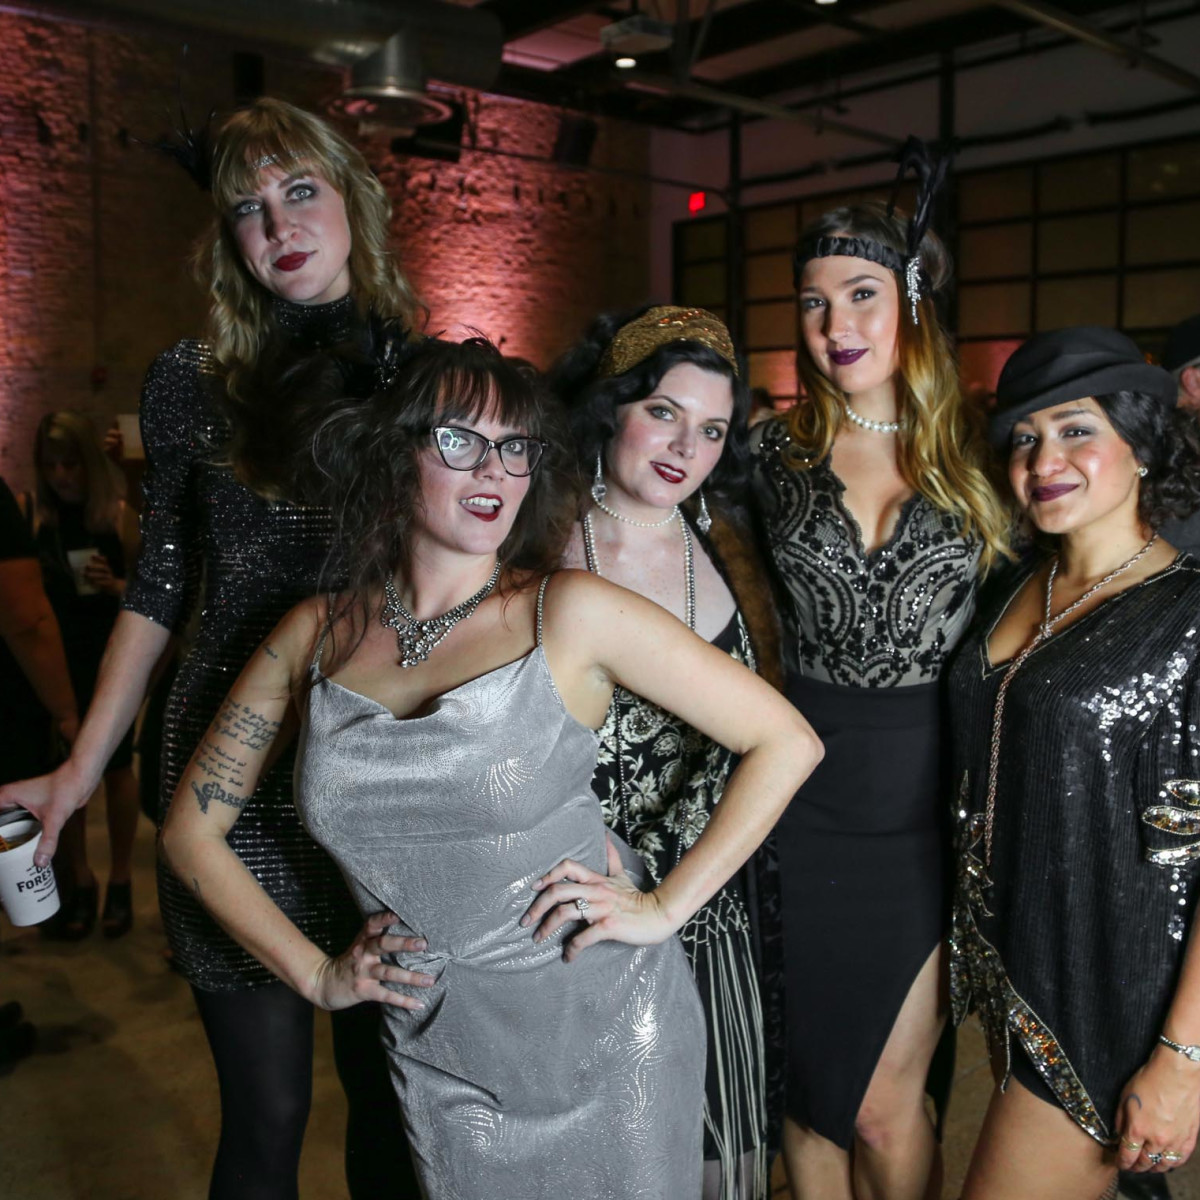 CultureMap Old Forester Bourbon Ball 2016 Maggie Leyenberger Kacy Todd Erin Freeman Katie Bykowski Wendy Bykowski